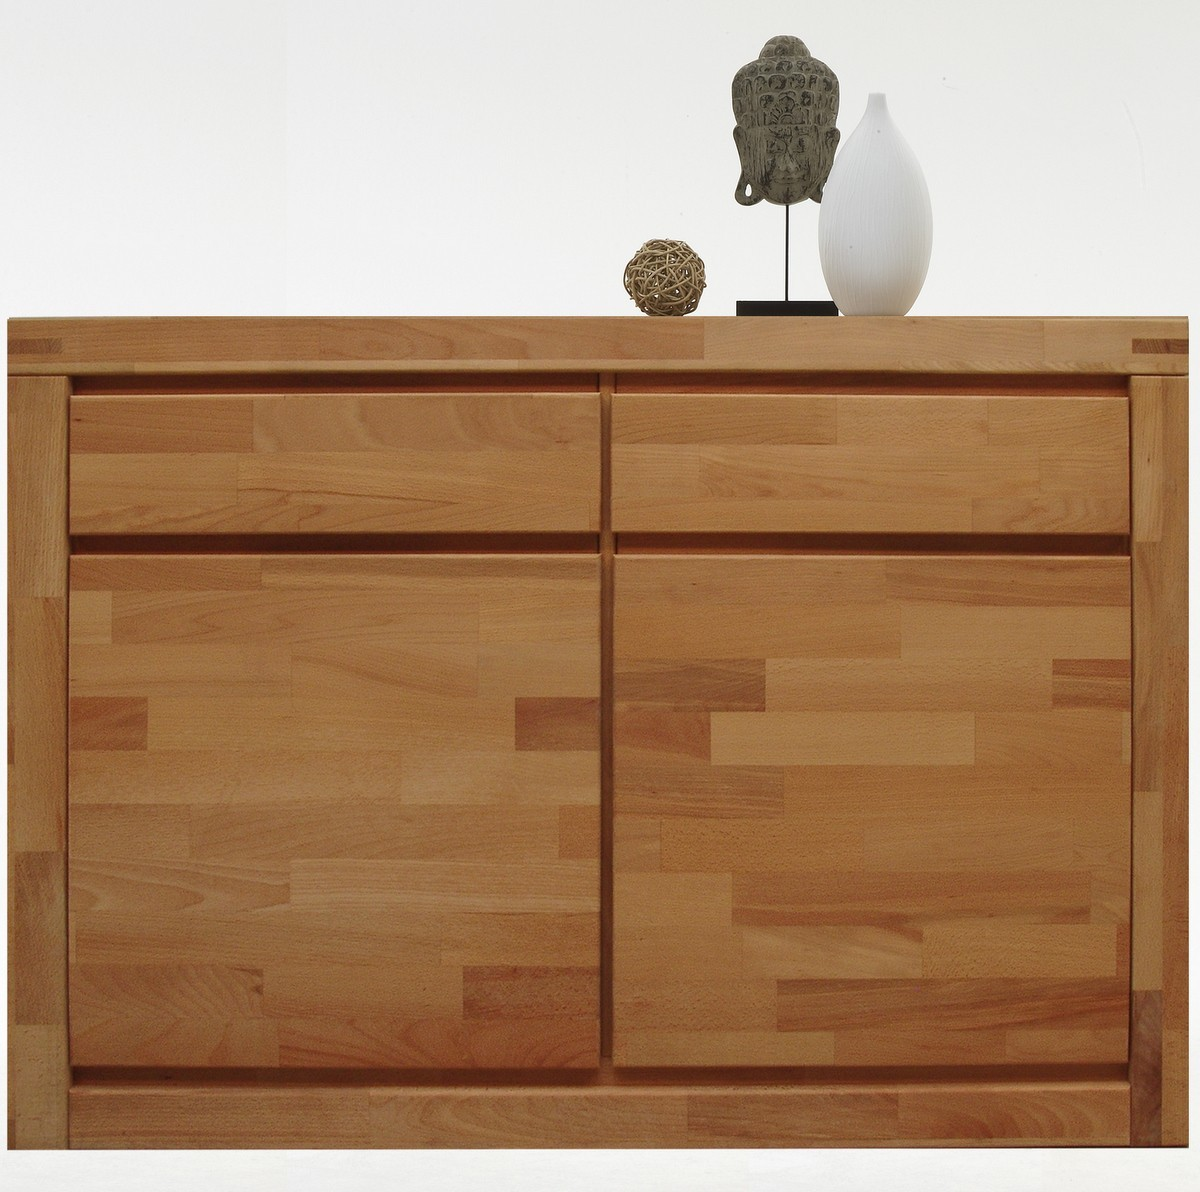 tv schrank kernbuche inspirierendes design f r wohnm bel. Black Bedroom Furniture Sets. Home Design Ideas